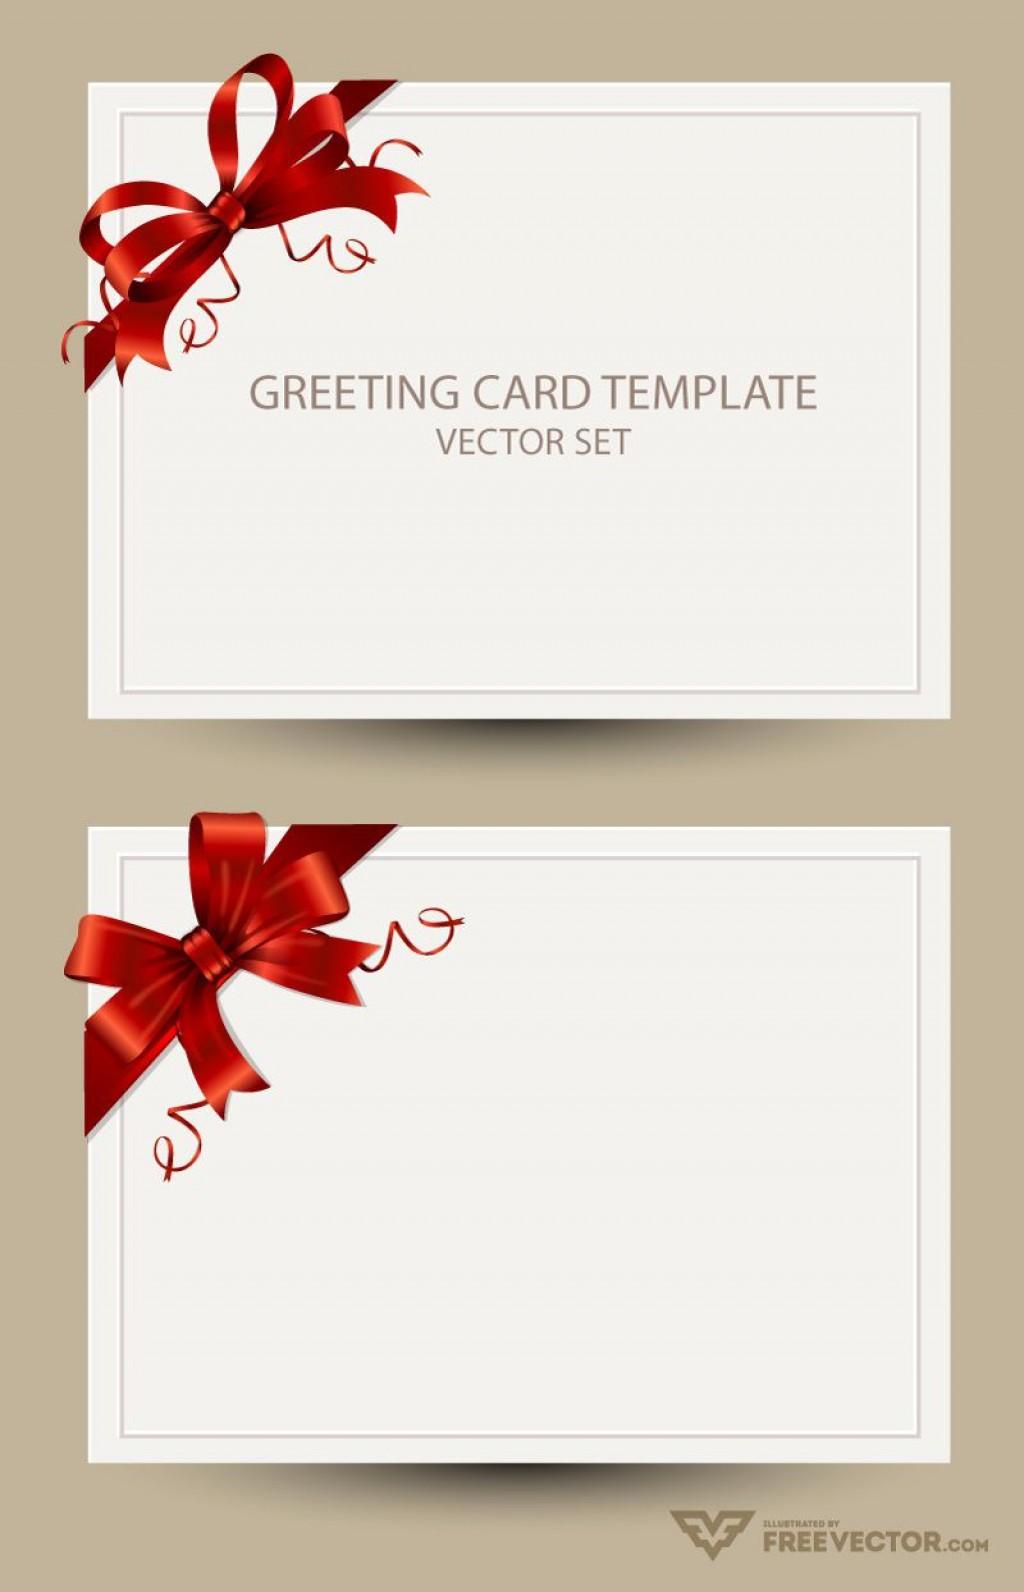 002 Rare Printable Greeting Card Template Image  Templates Print Free BirthdayLarge